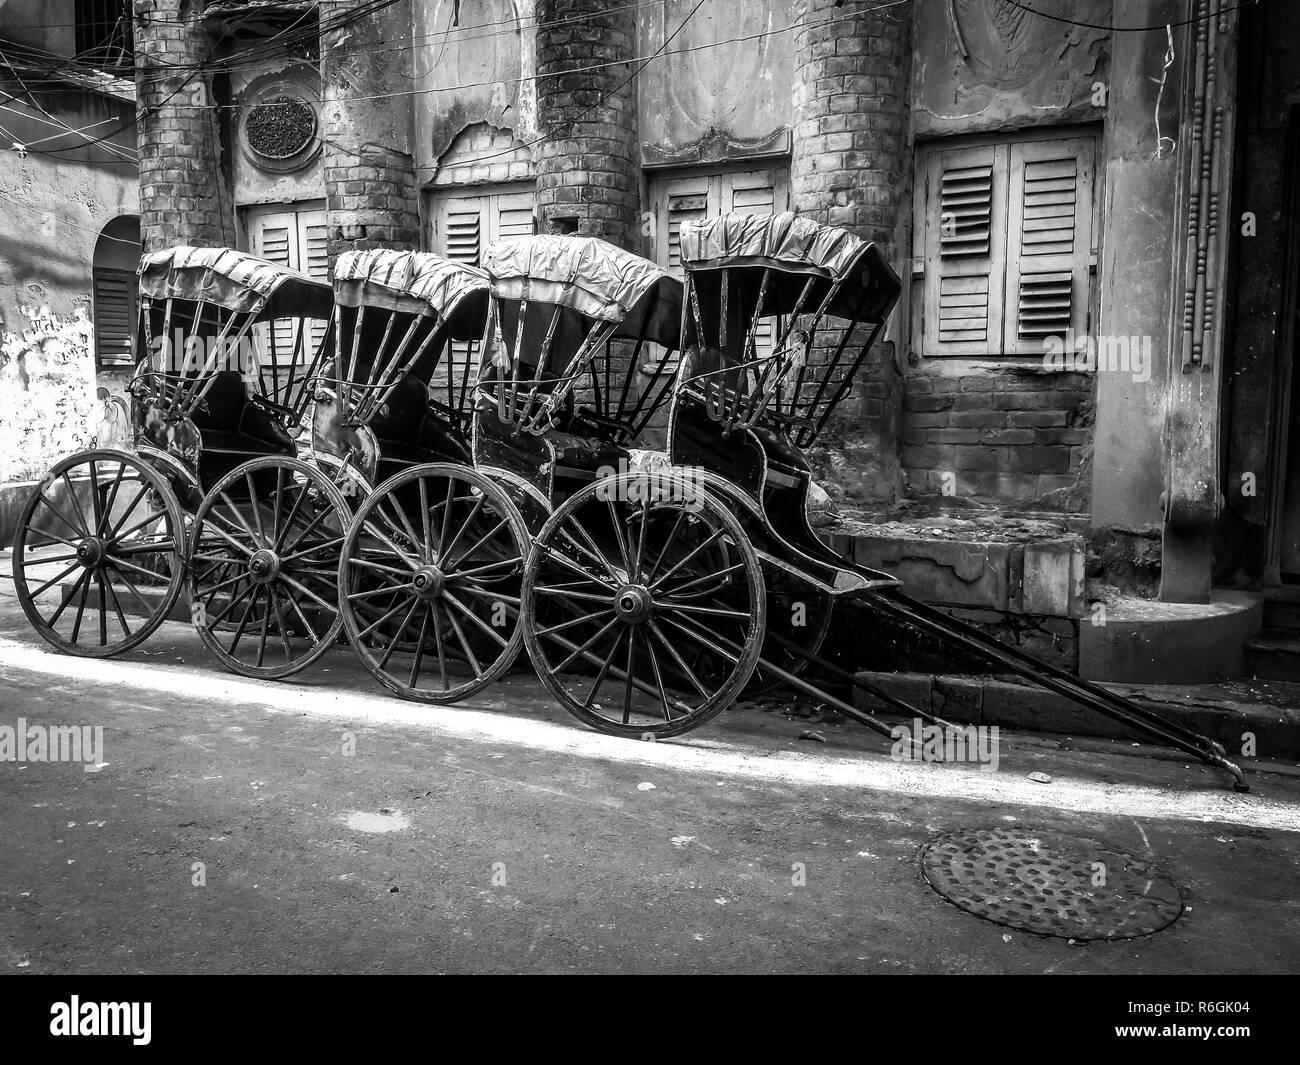 Hand pulled rickshaw on the streets of kolkata calcutta india stock image